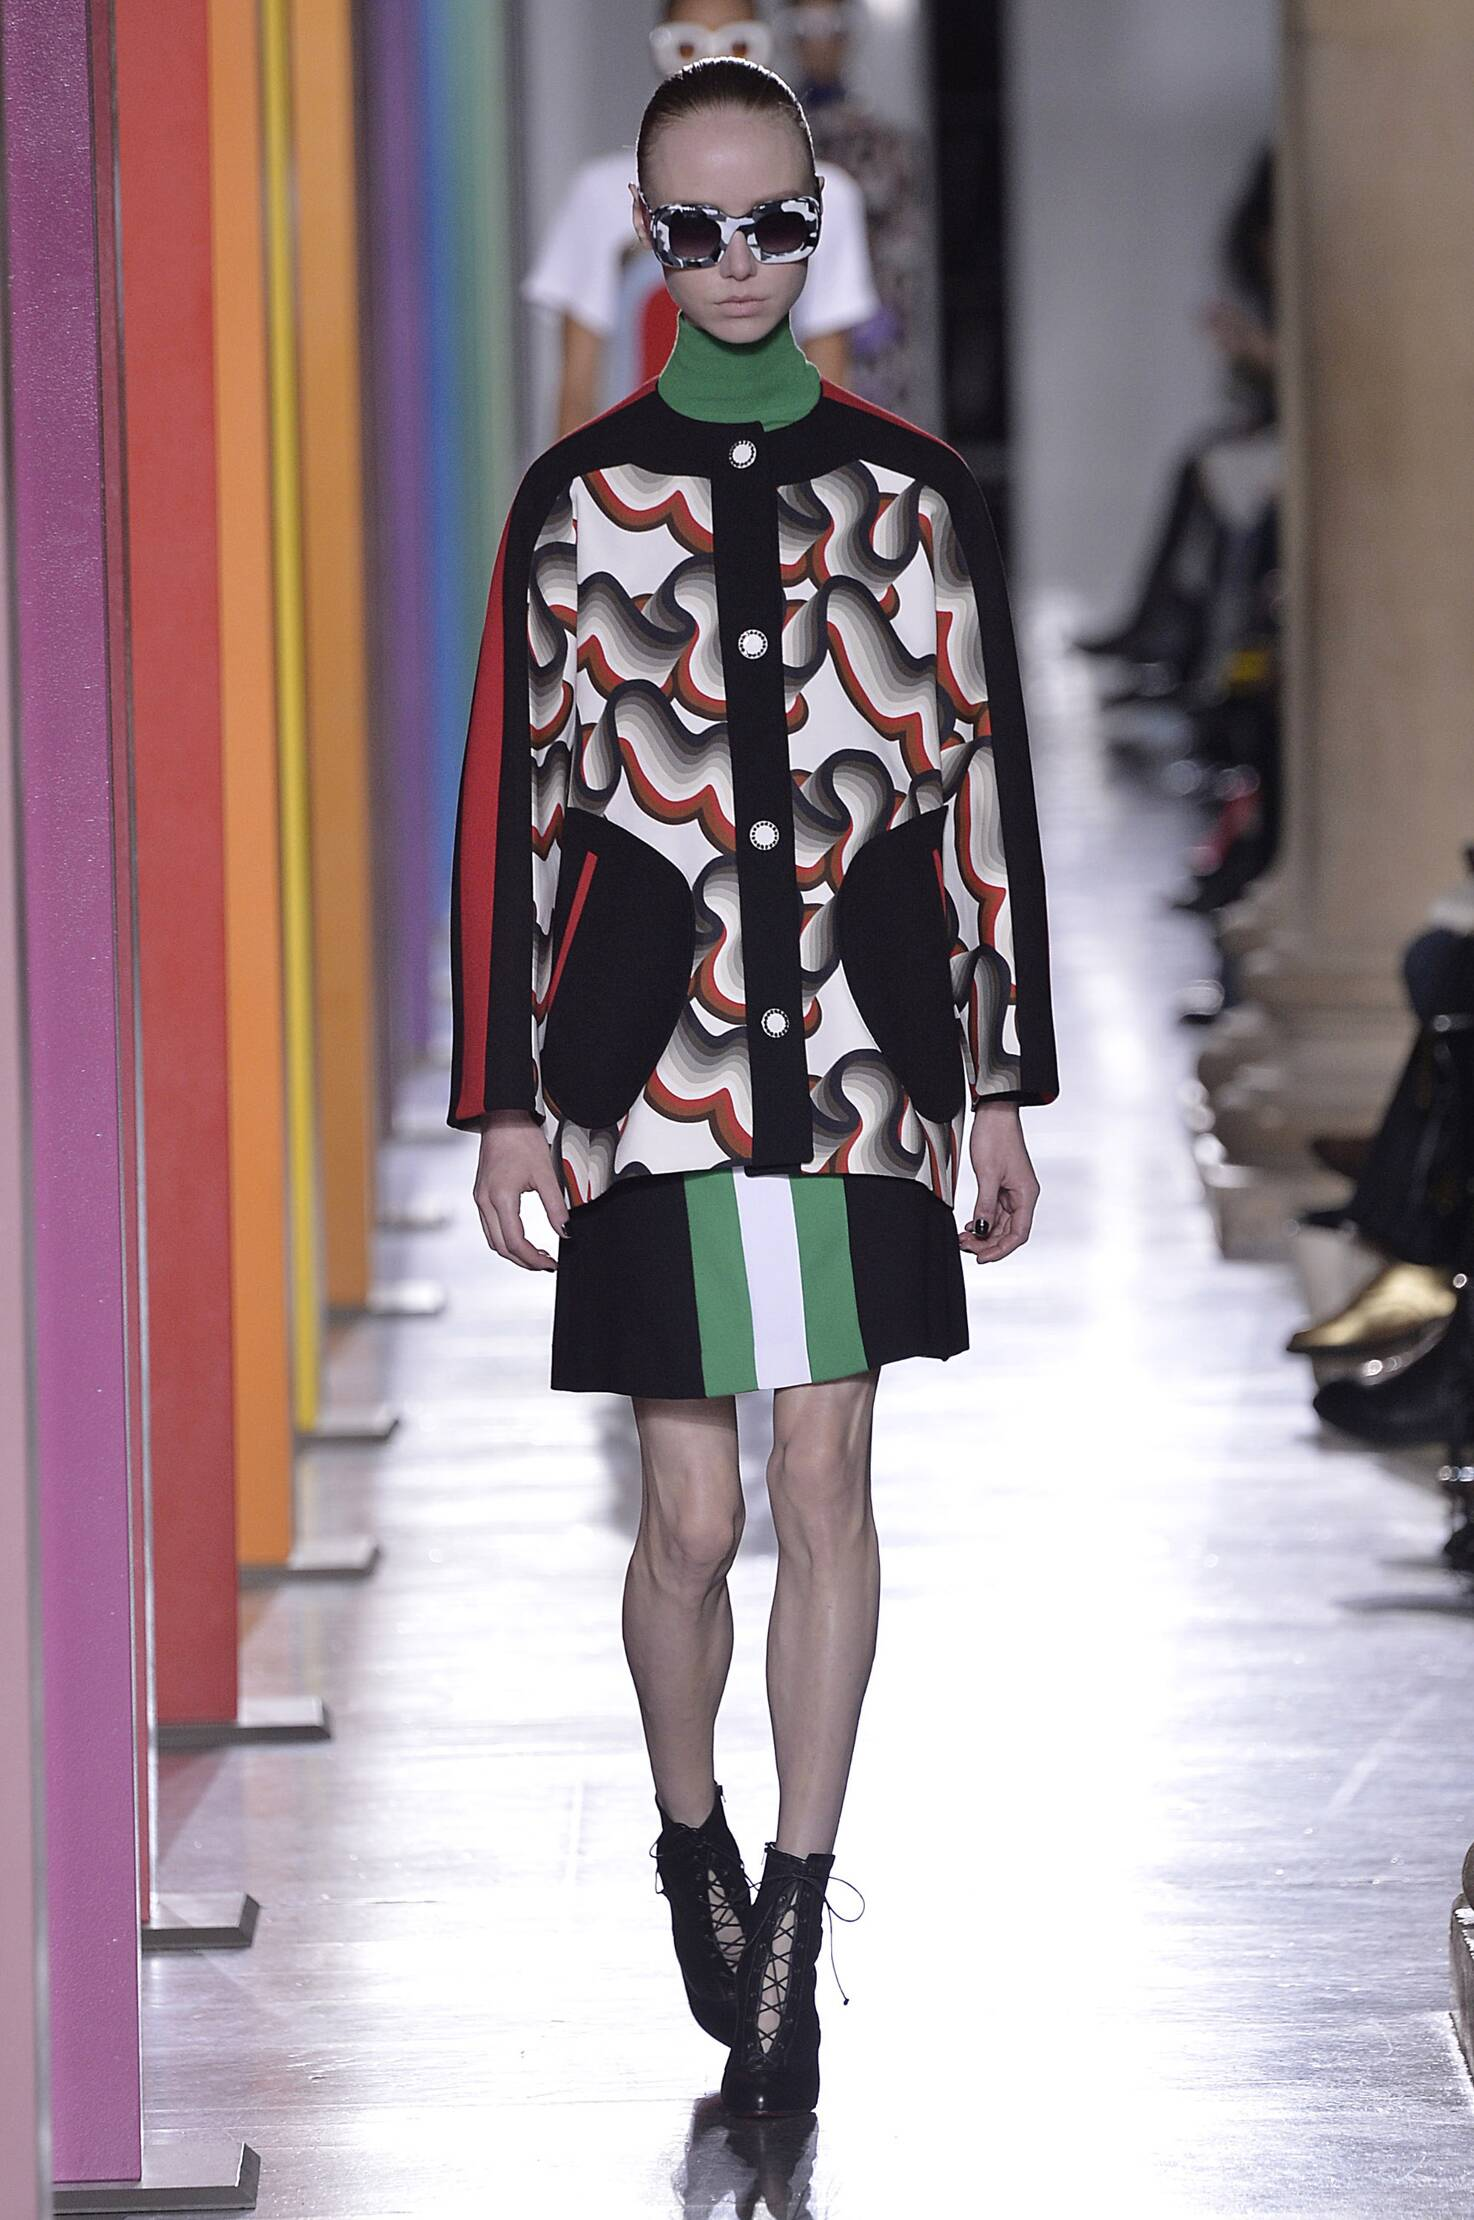 Winter 2015 Fashion Show Jonathan Saunders Collection